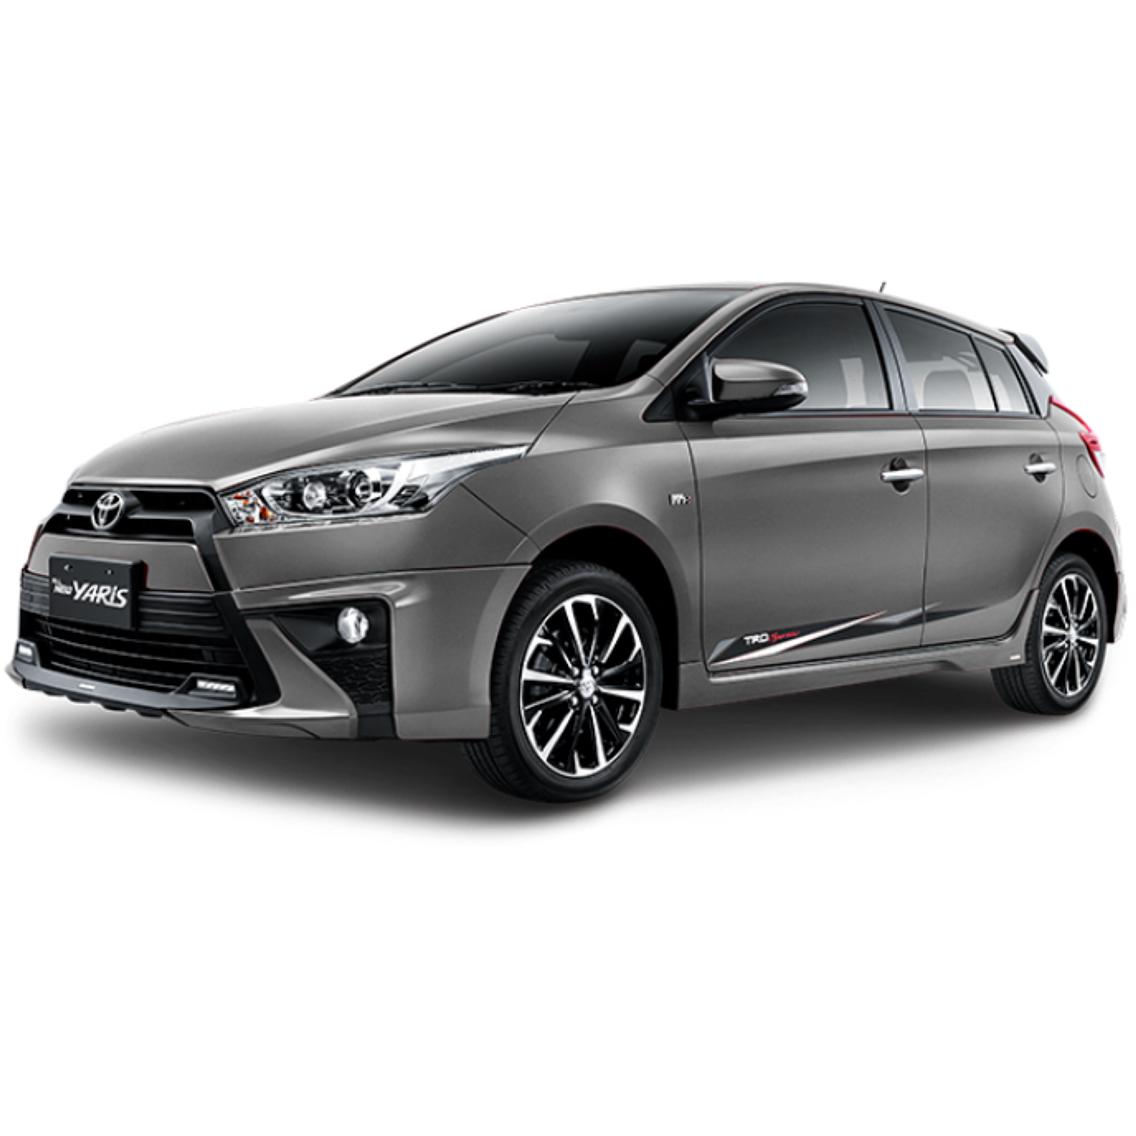 Harga New Yaris Trd 2018 All Kijang Innova Semisena Mobil Toyota Semarang Sales Promo Kredit